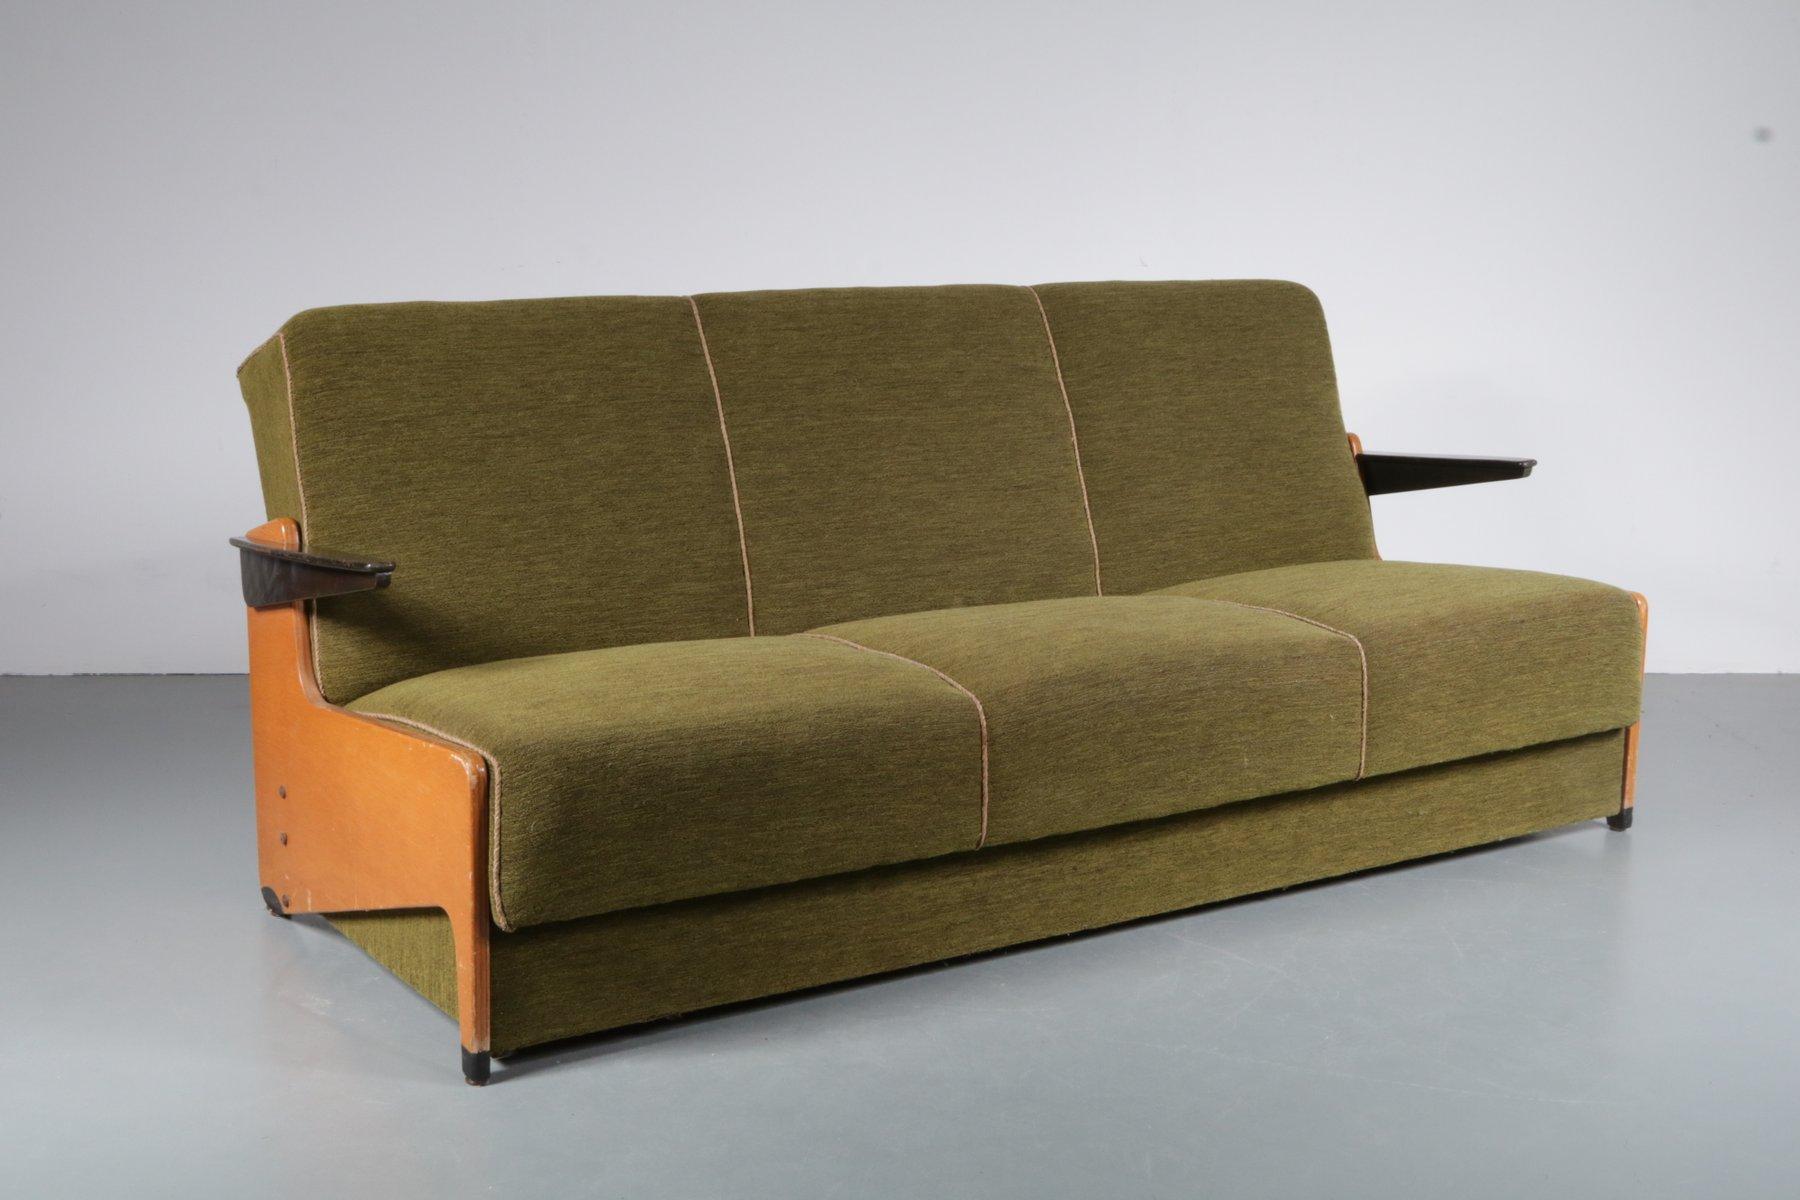 3-Sitzer Schlafsofa, 1950er